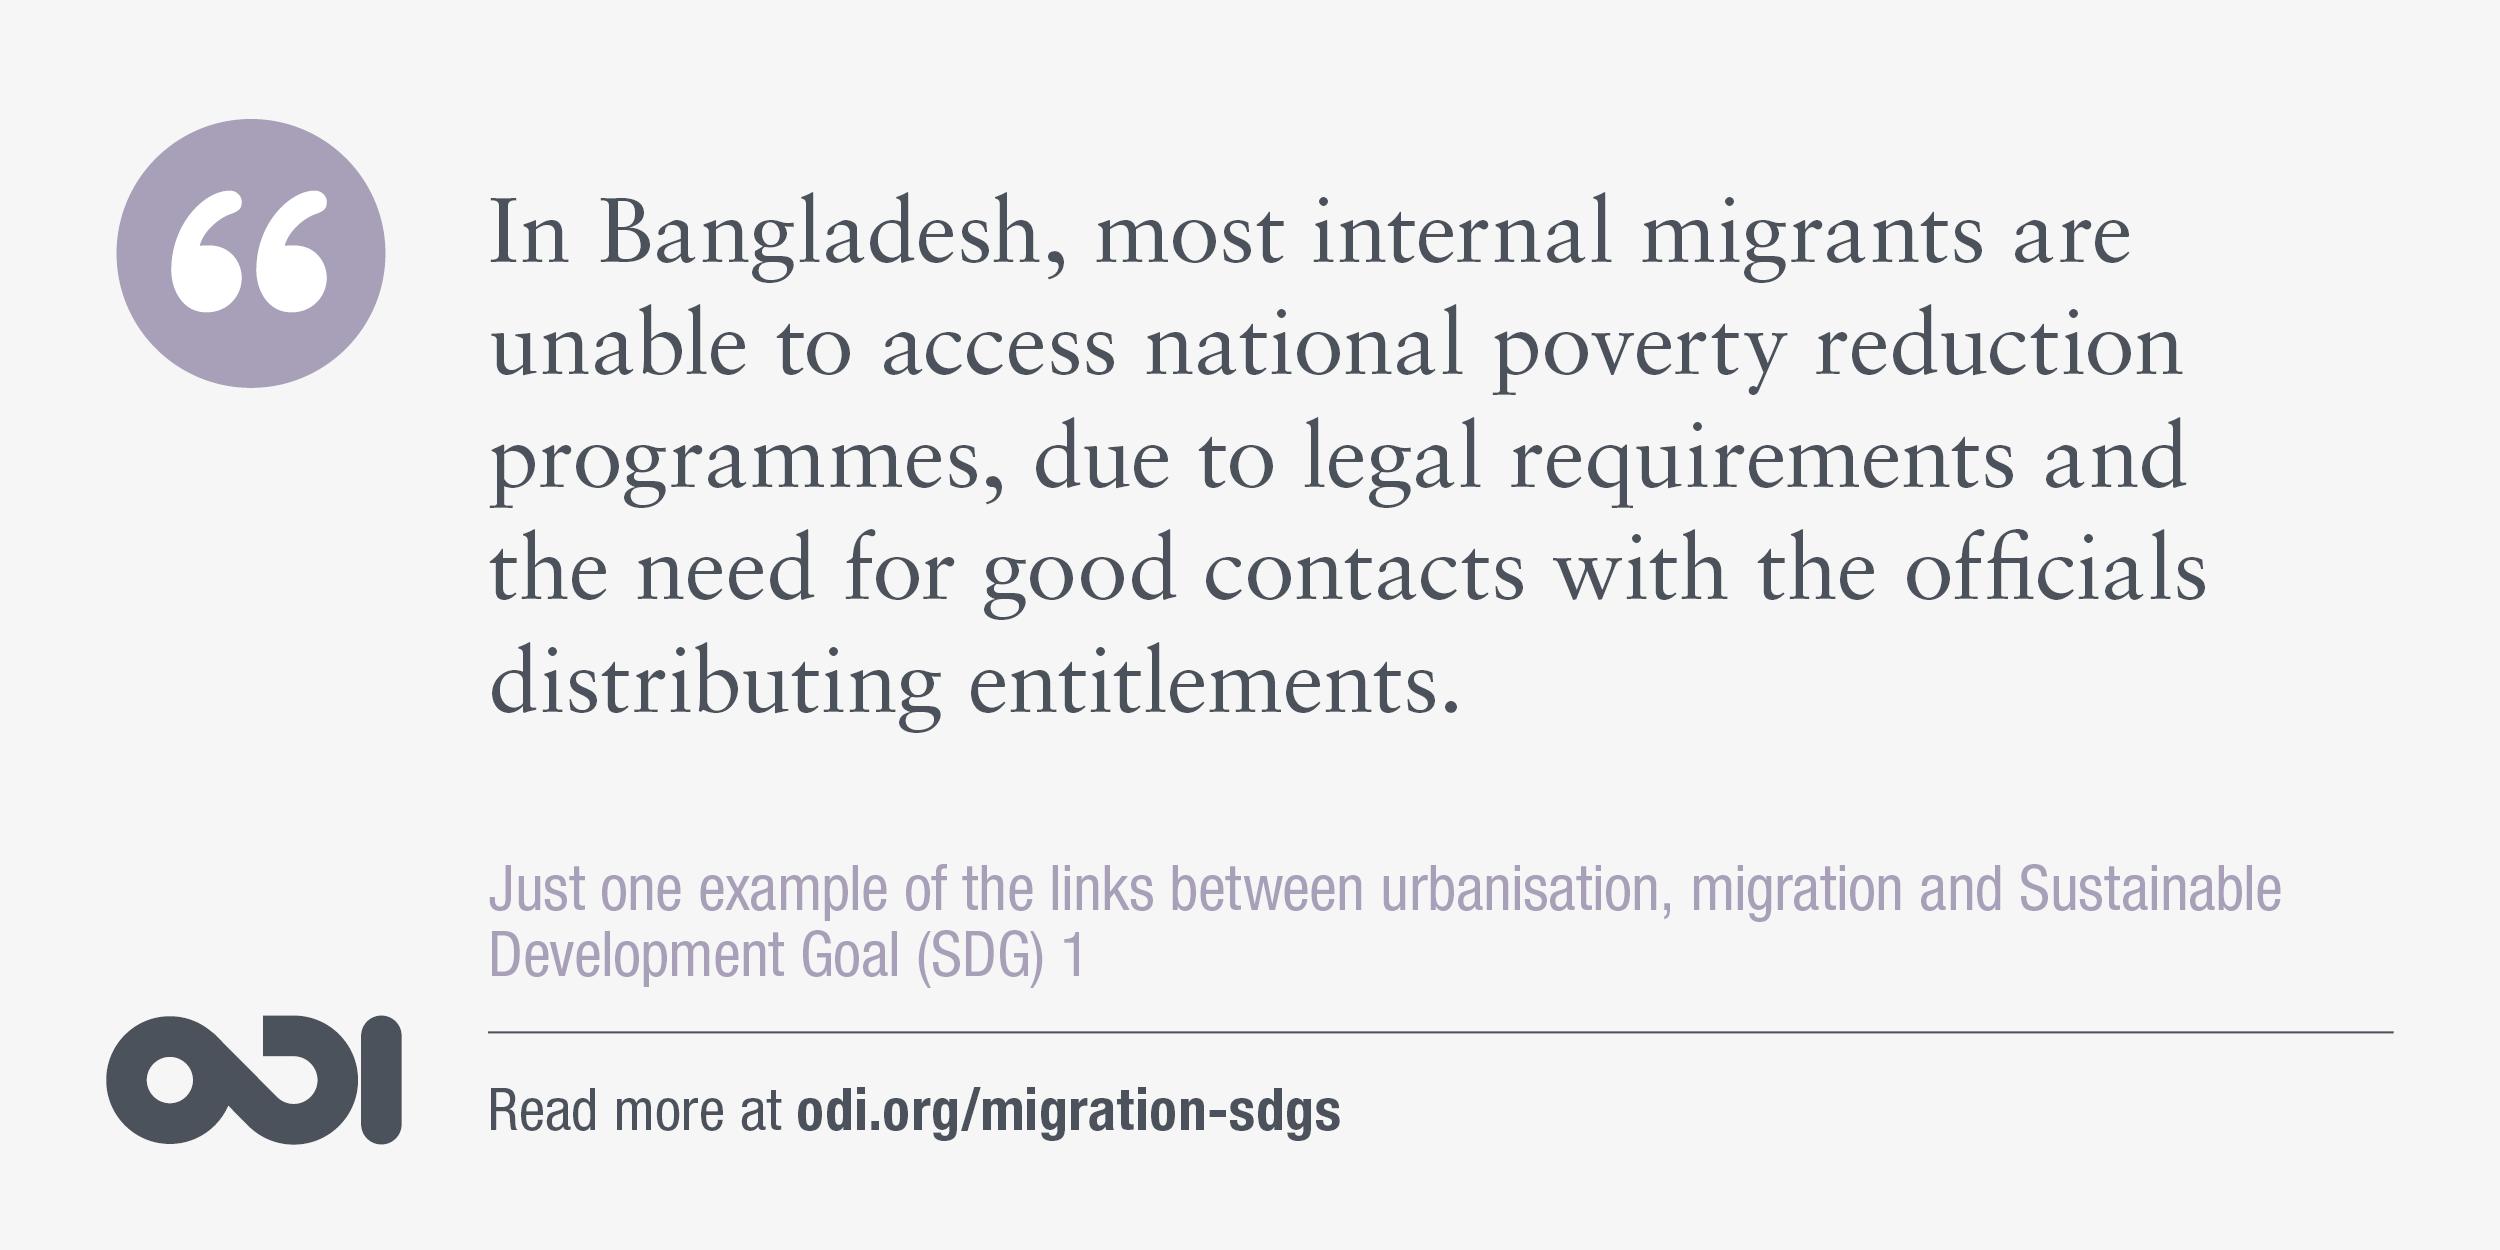 The links between urbanisation, migration and SDG 1.